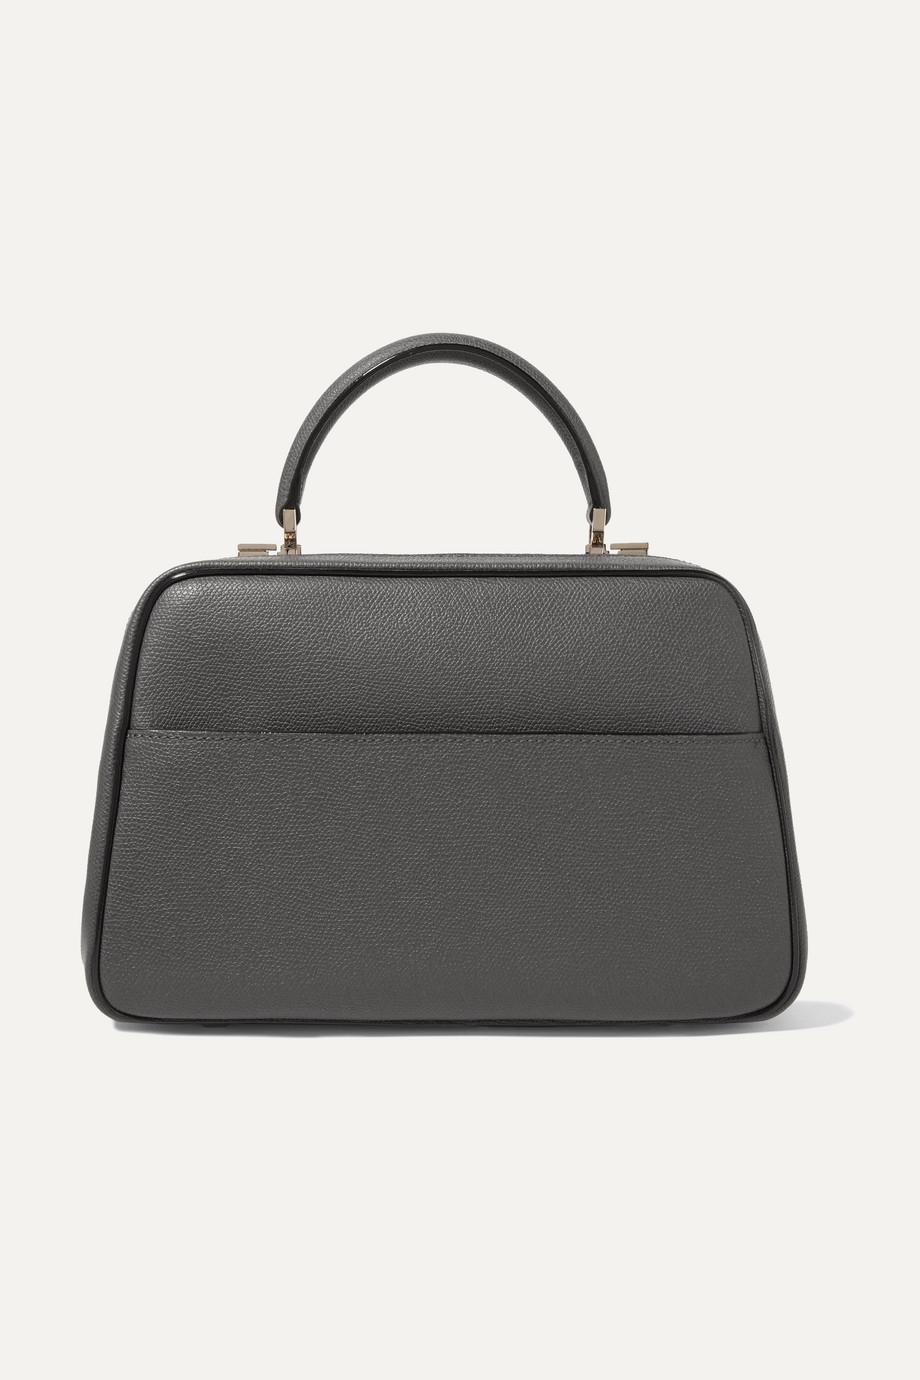 Valextra Serie S medium textured-leather tote